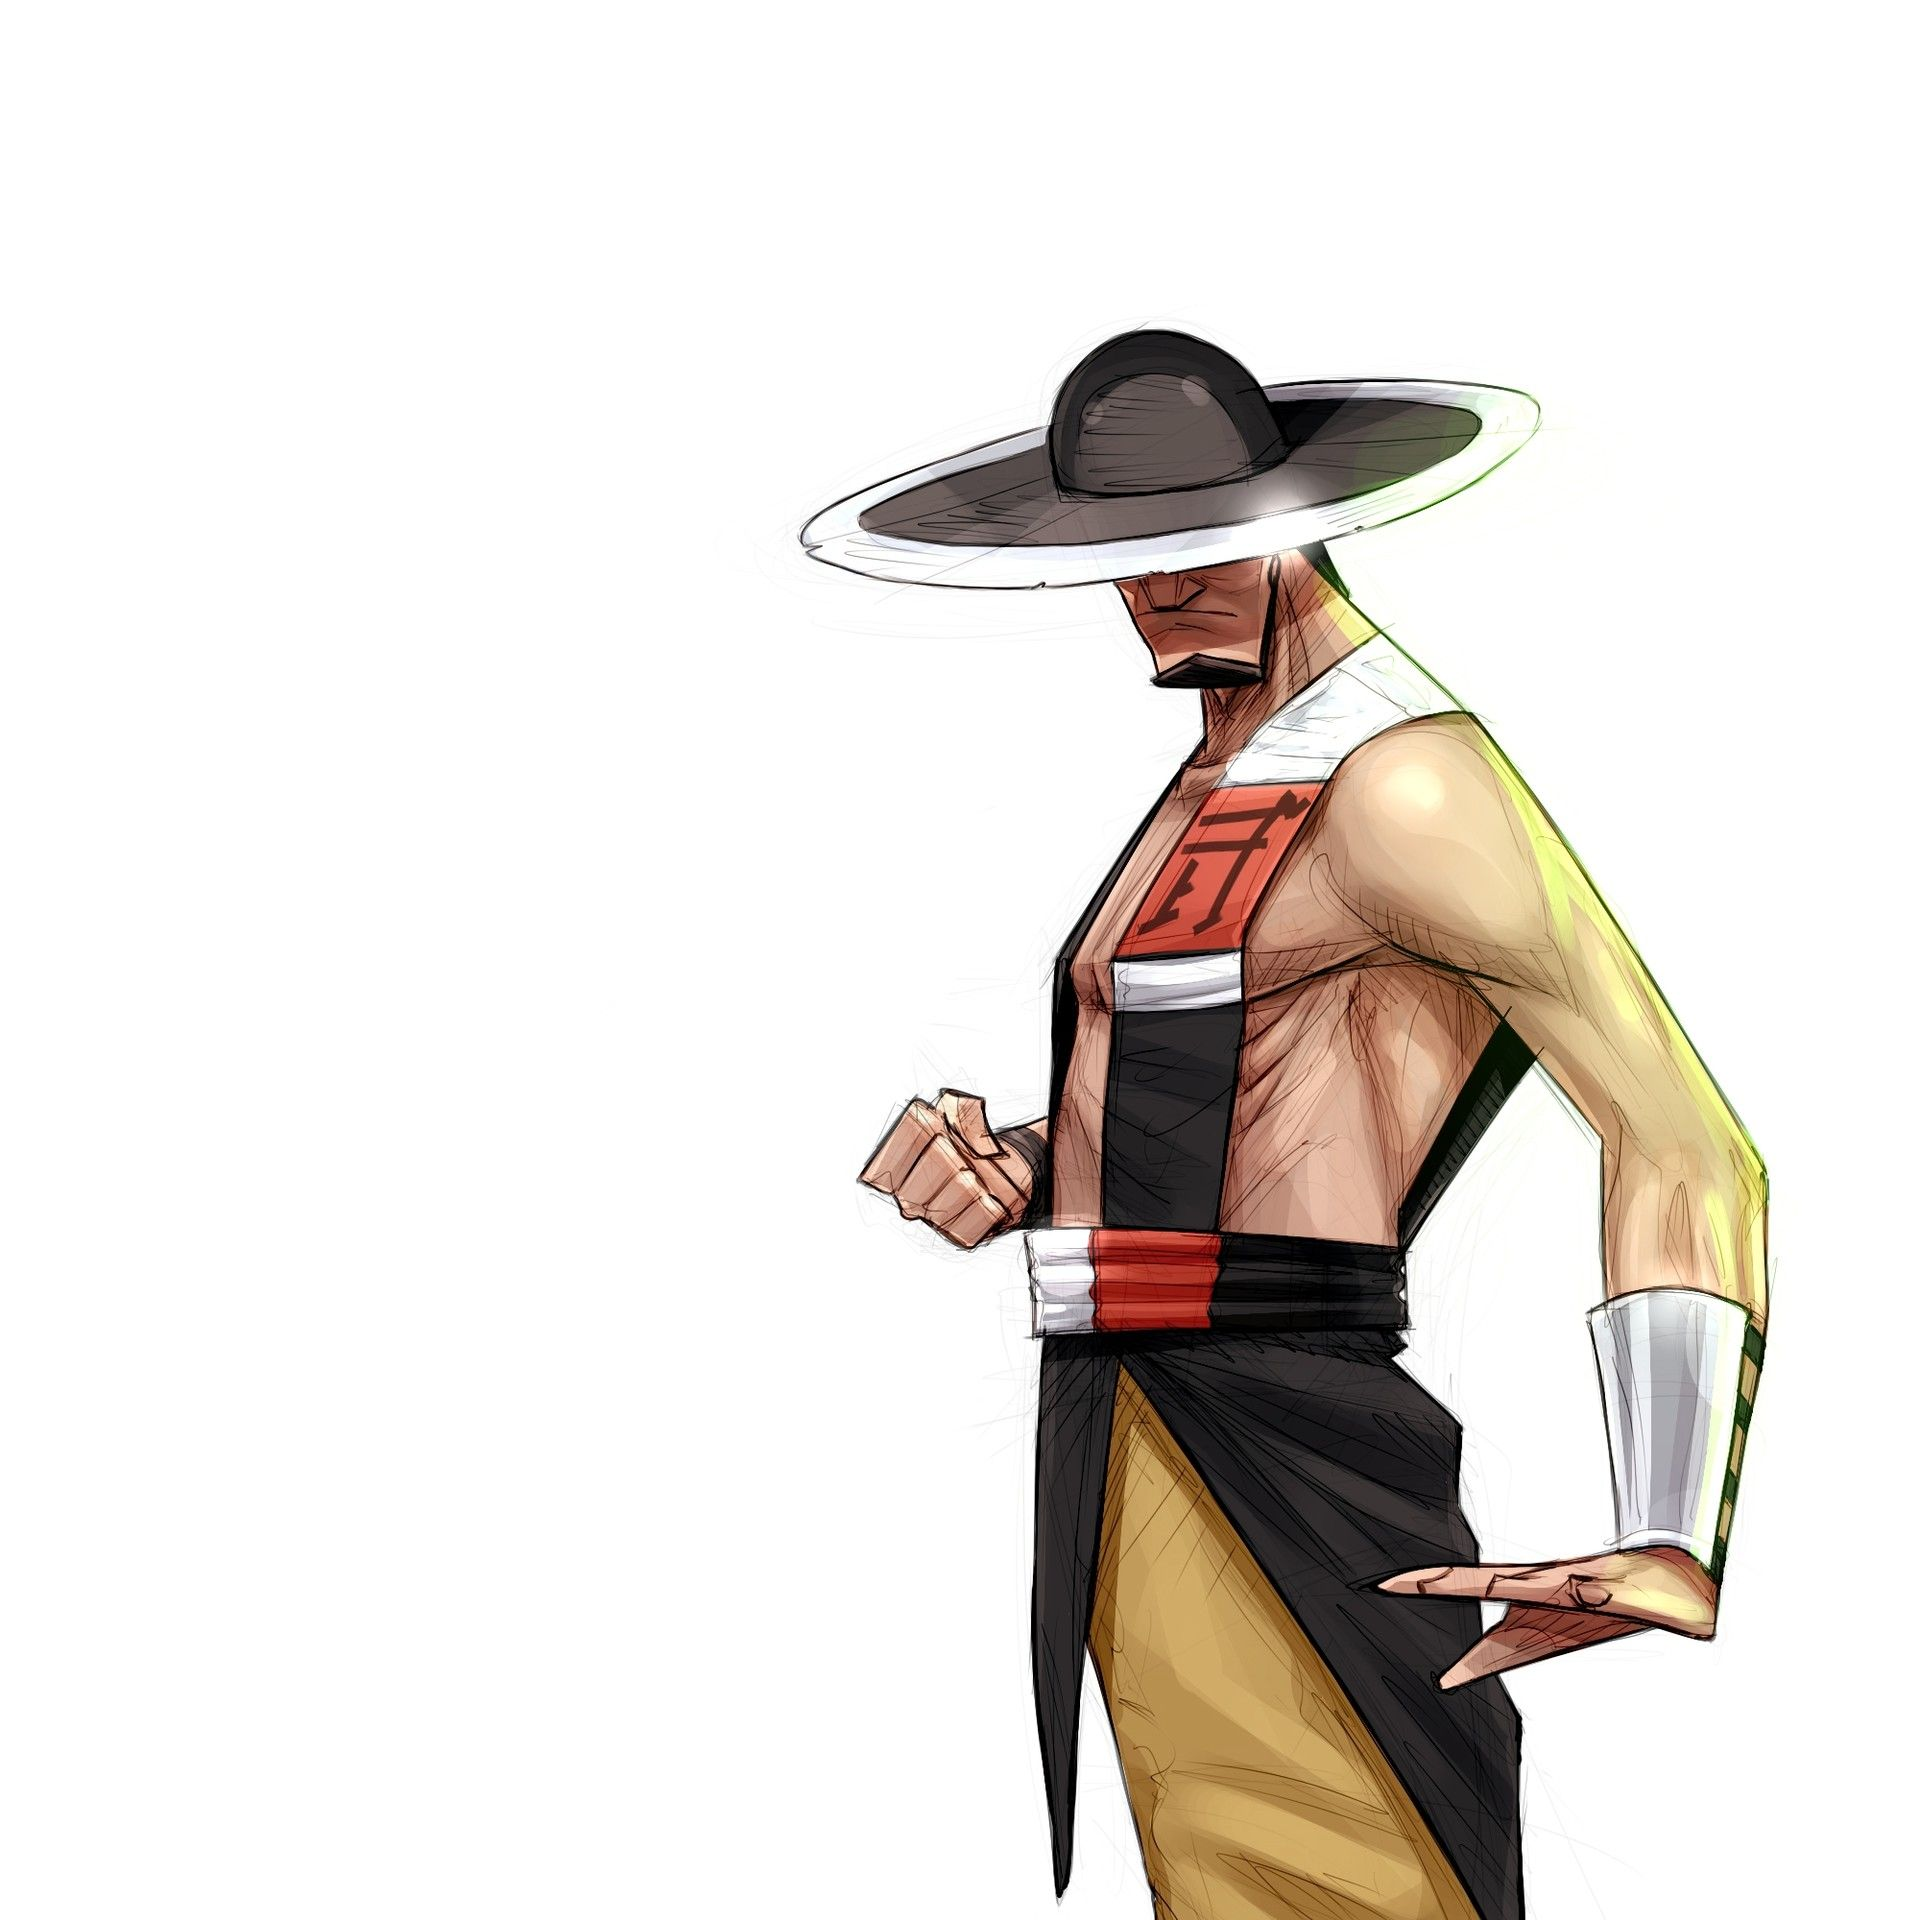 Artstation Kung Lao Mk3 Evgeny Yurichev Mortal Kombat Characters Mortal Kombat Art Mortal Kombat